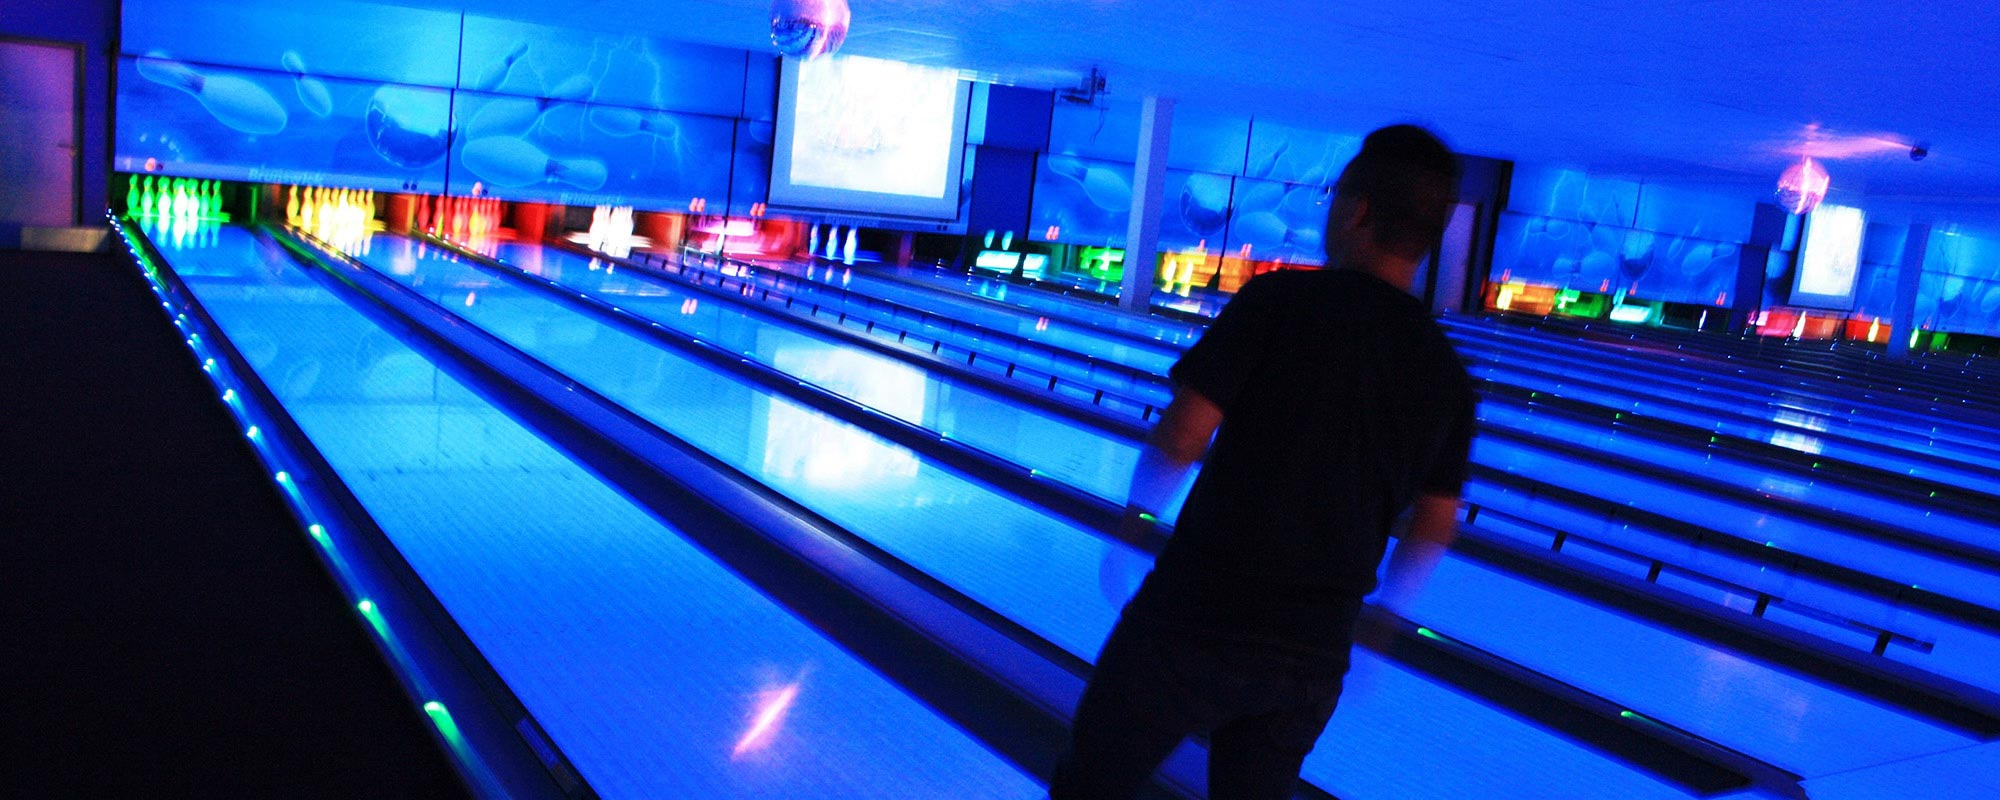 ebafkc-bowling-2000x800-04